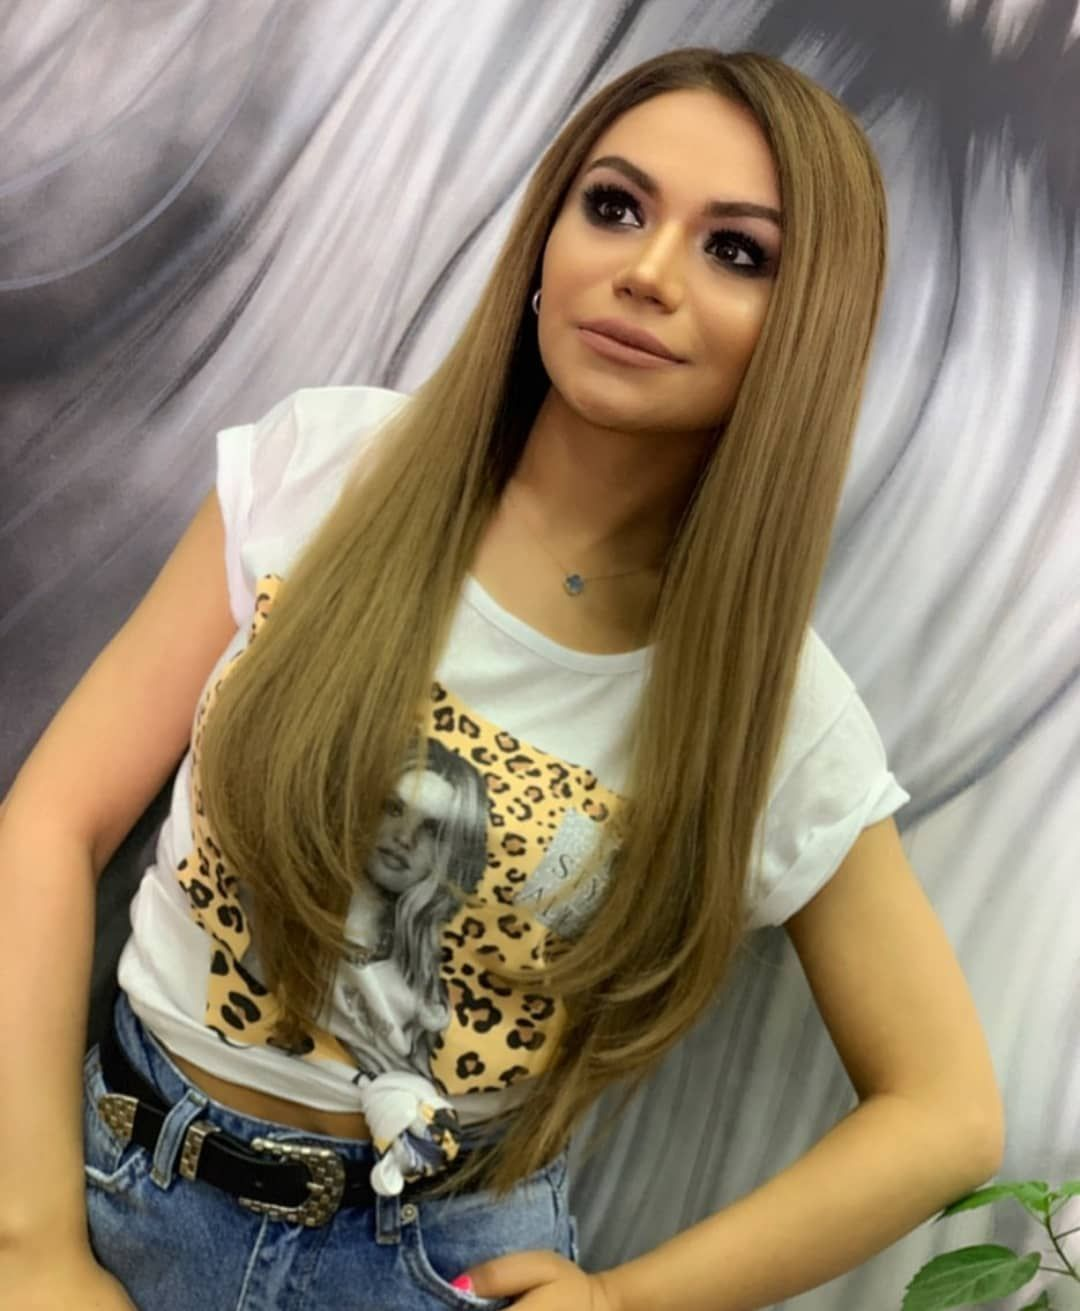 Turkan Valizade Official Turkanvelizade Pervizturkanfan Pervizbulbule Pervizbulbule Azerbaijan Azerbaycan Baki Baku Rostov Krasnodar Long Hair Styles